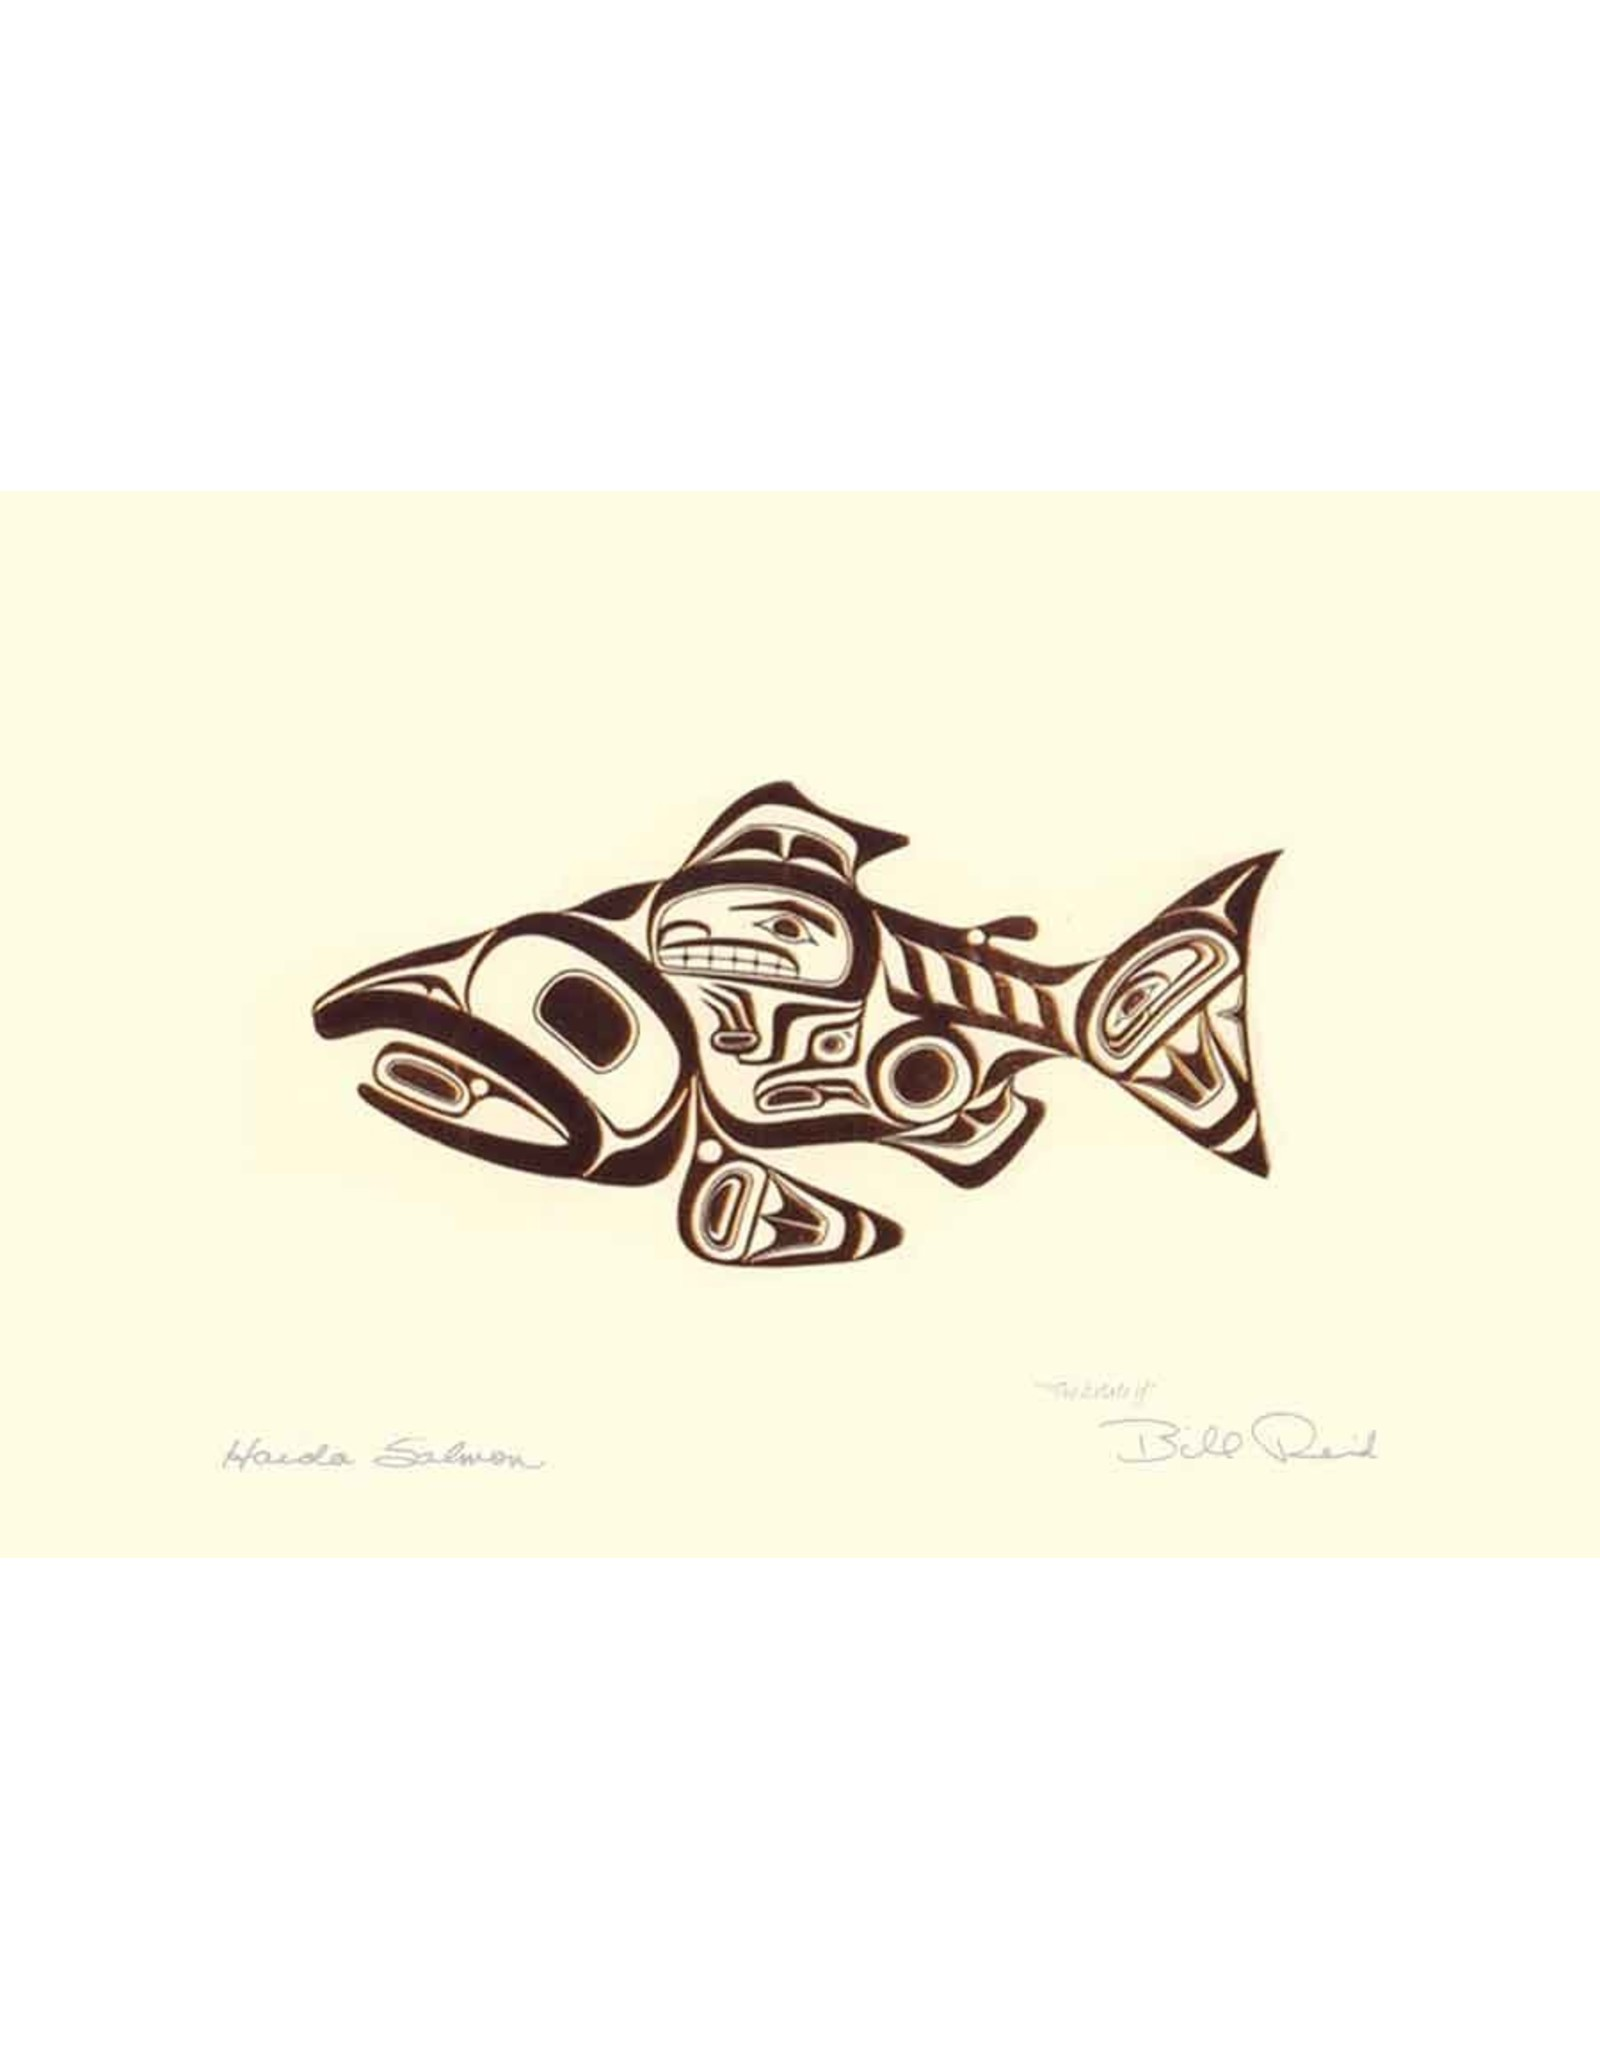 Haida Salmon by Bill Reid Matted 7440